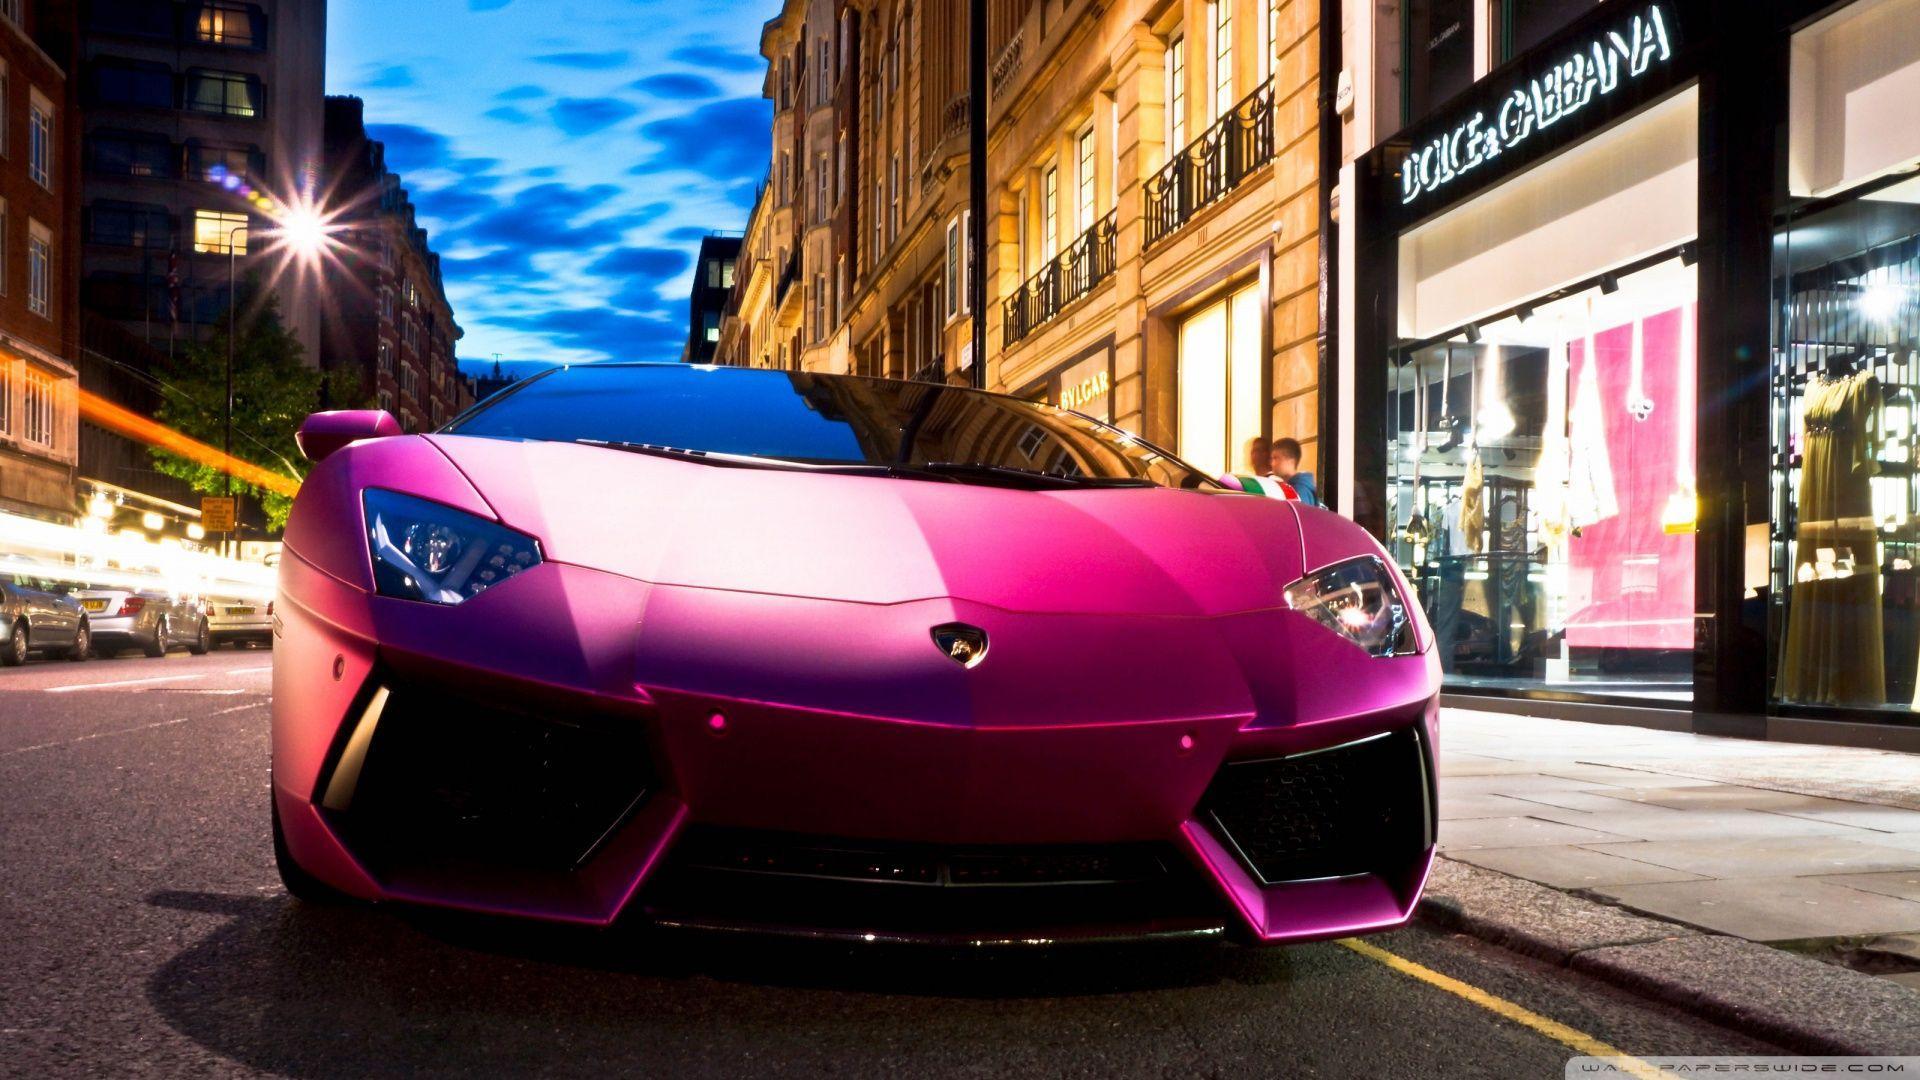 Pink Lamborghini Wallpapers Top Free Pink Lamborghini Backgrounds Wallpaperaccess